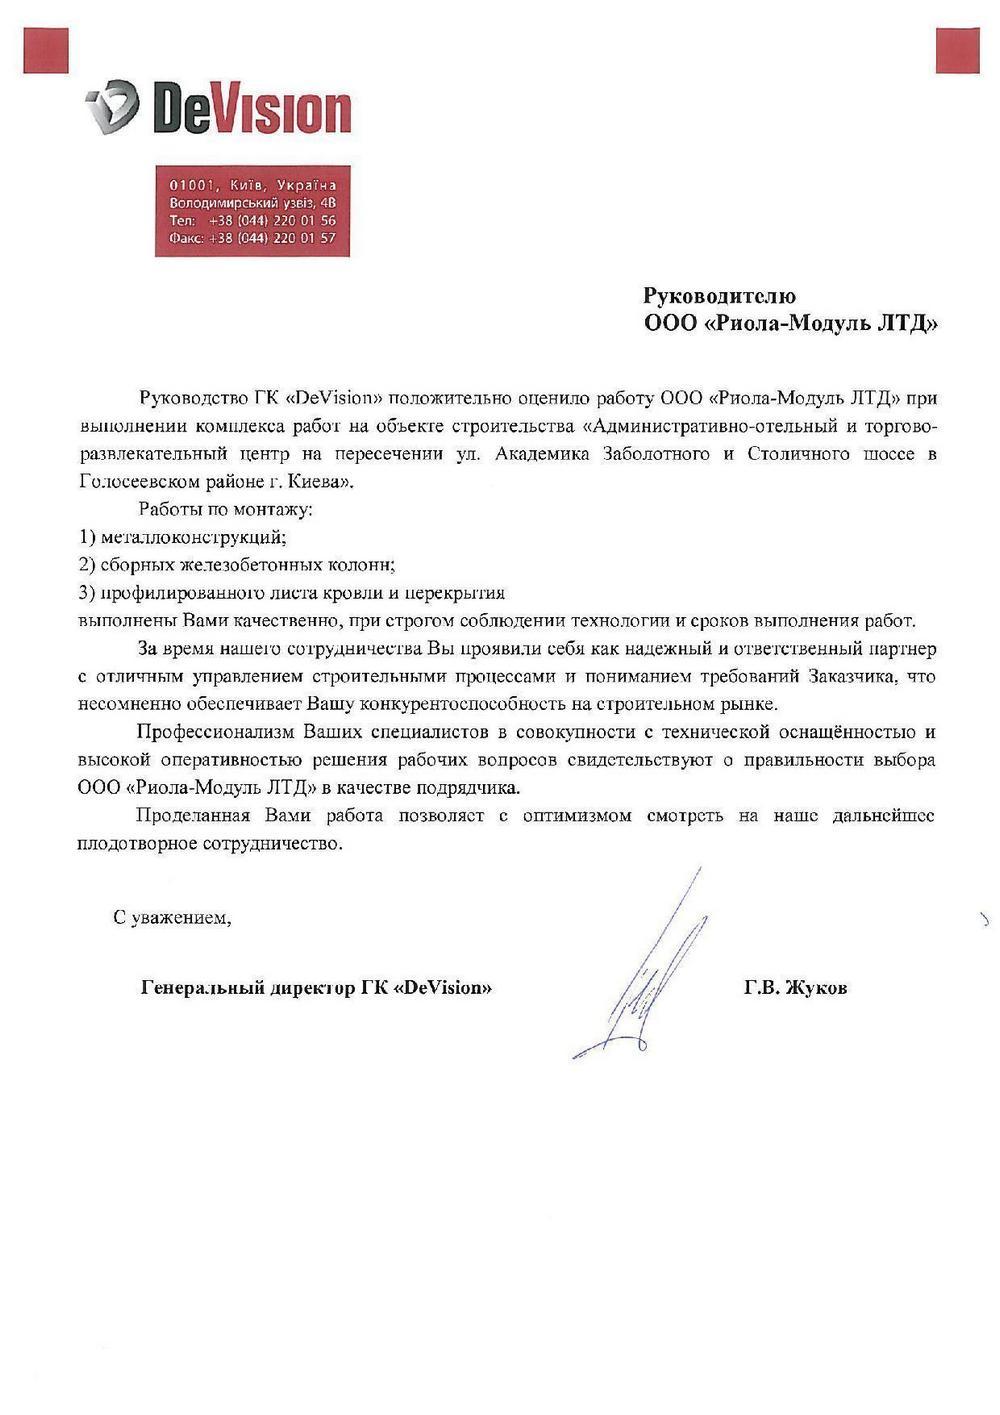 rekomendatsiya kompanii riola modul